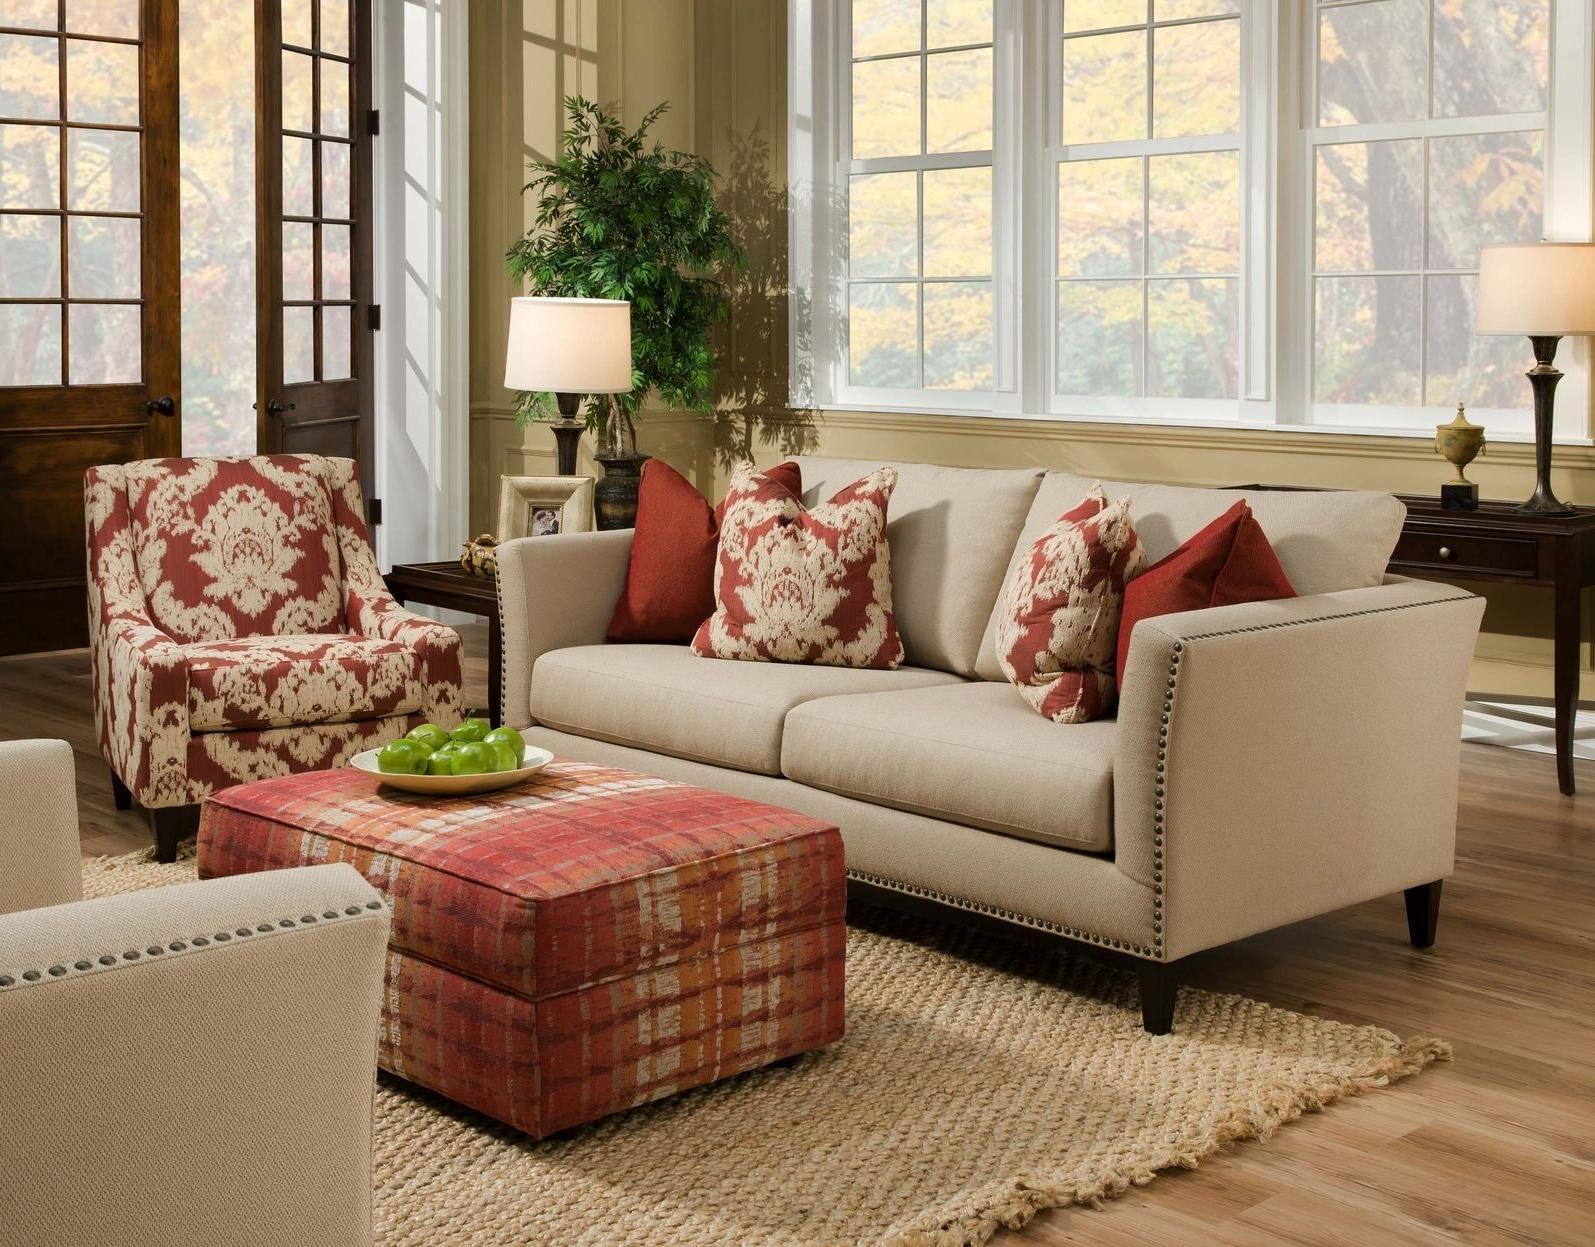 Kijiji Mississauga Sectional Sofas Throughout Latest Park's Furniture Hamilton, On Ashley Furniture Stoney Creek (View 8 of 20)